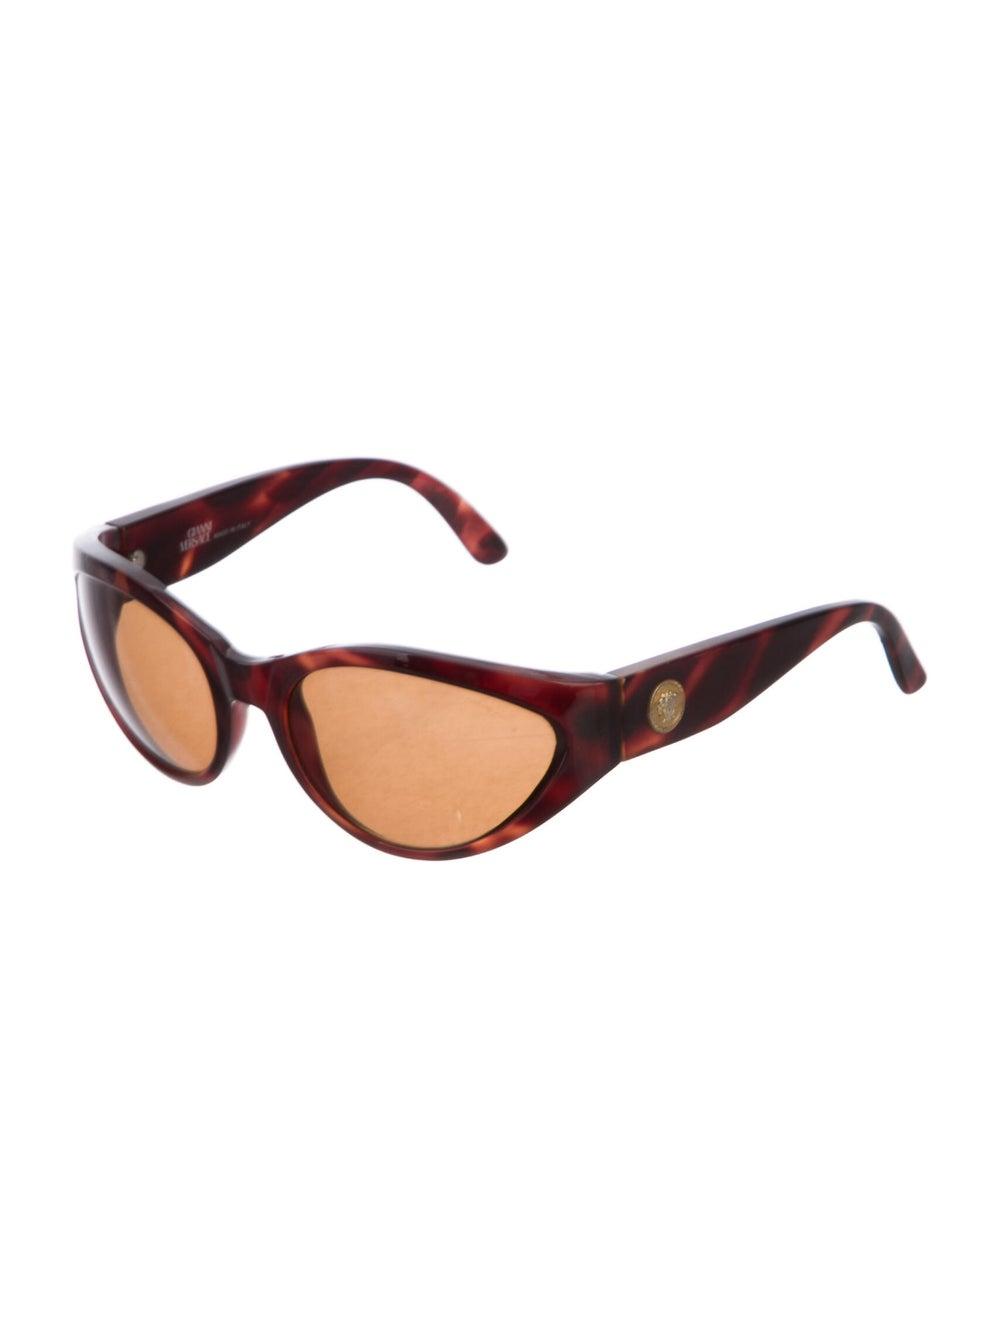 Gianni Versace Cat-Eye Tinted Sunglasses Brown - image 2